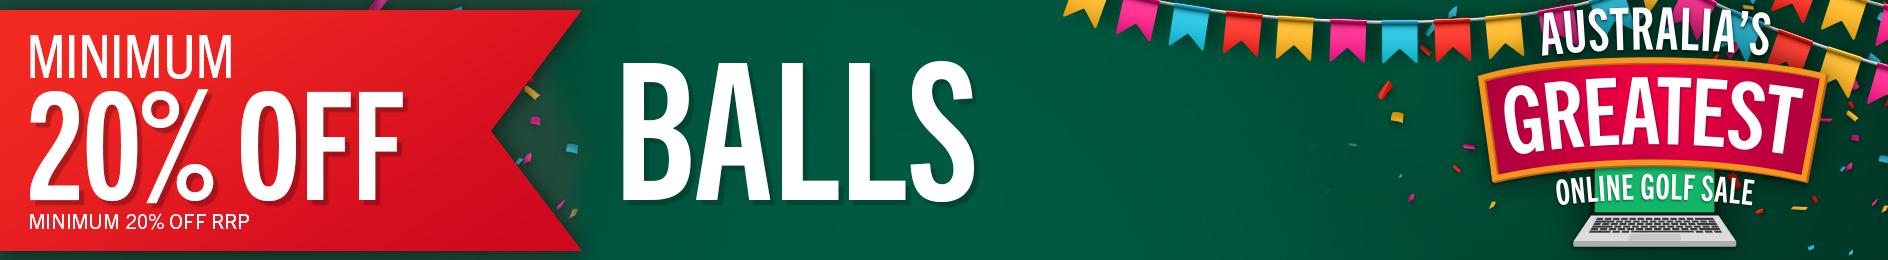 GolfBox Online Sale - Minimum 20% Off Balls